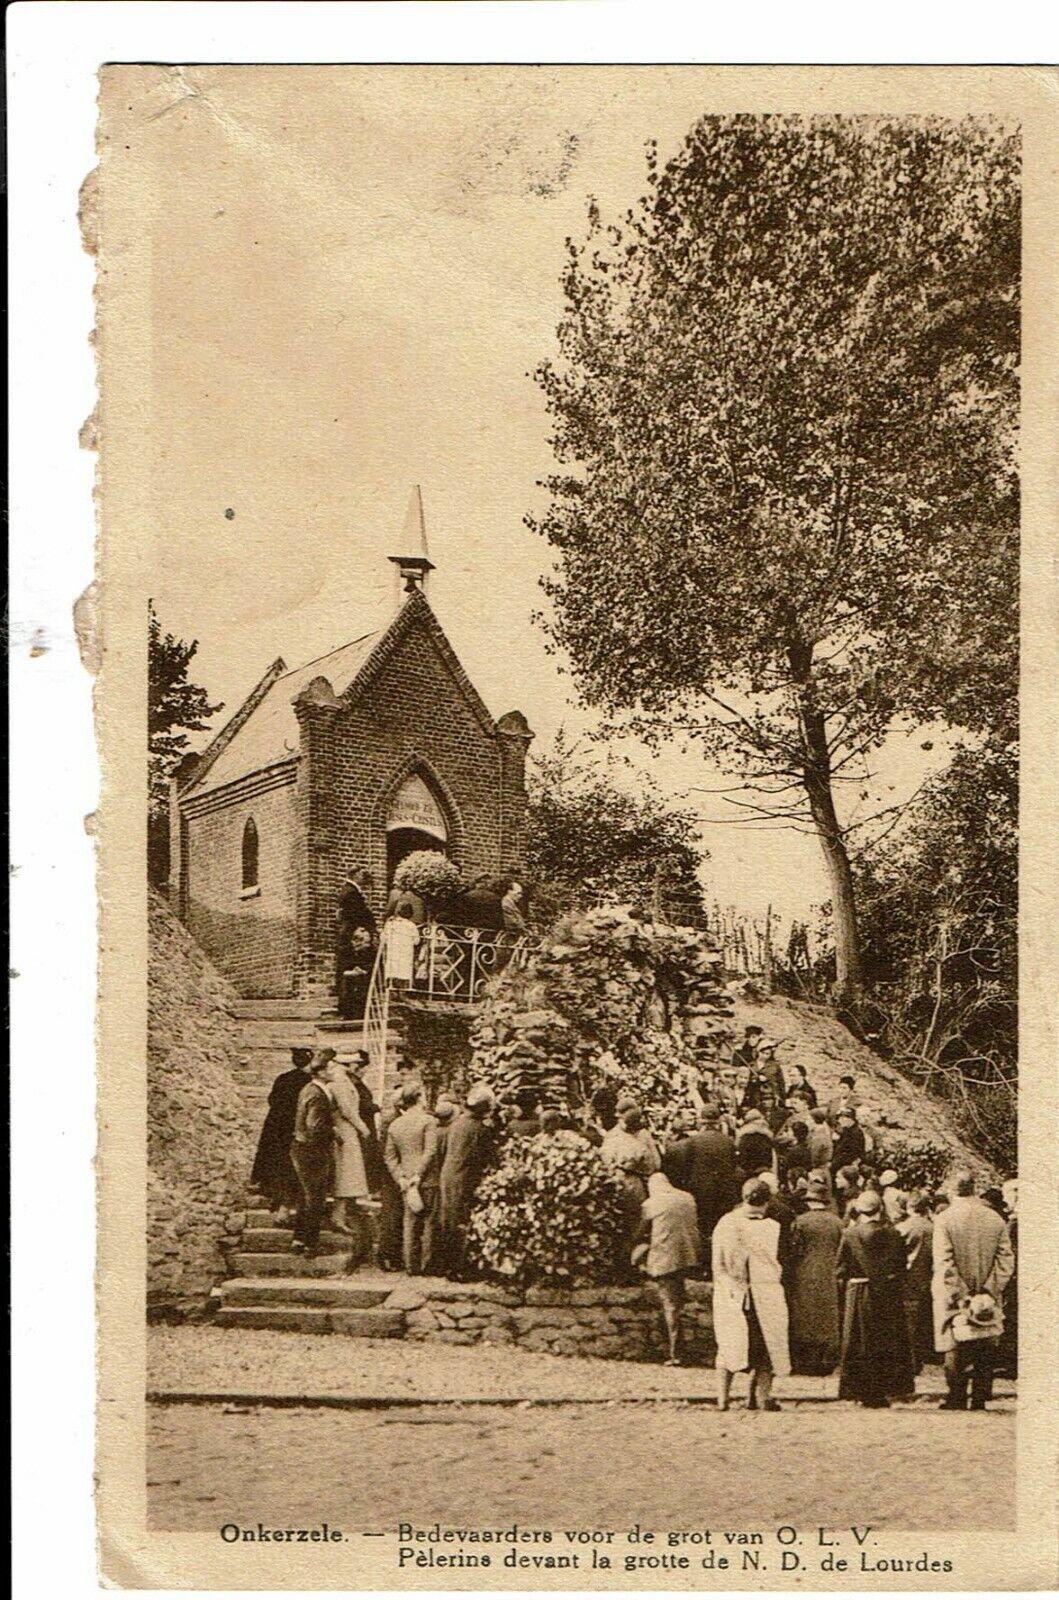 CPA-Carte postale -BELGIQUE-Onkerzele-Pèlerins devant la grotte de N..Dame